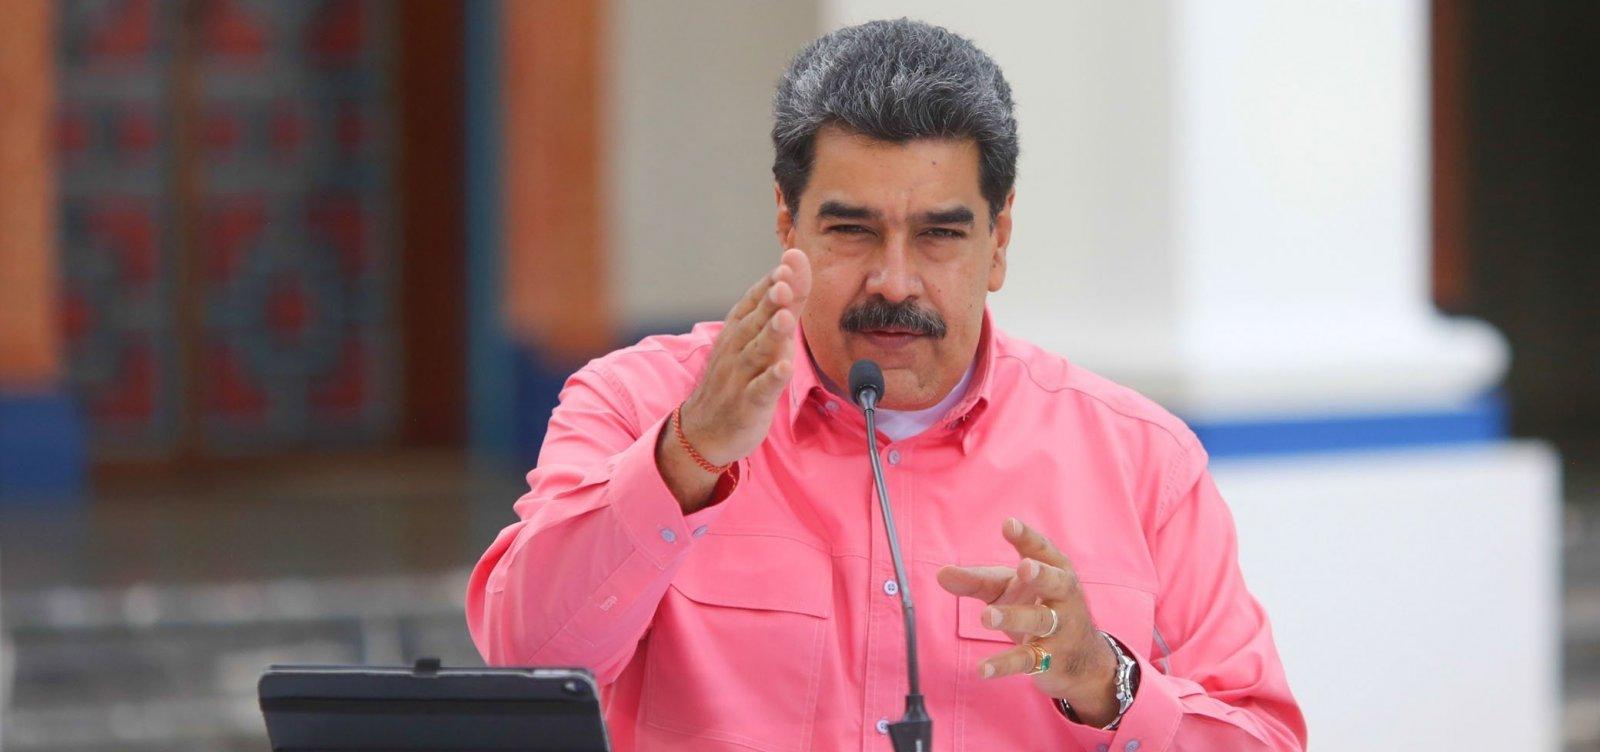 [Variante da Covid no Brasil deveria se chamar 'Bolsonaro', afirma Maduro]